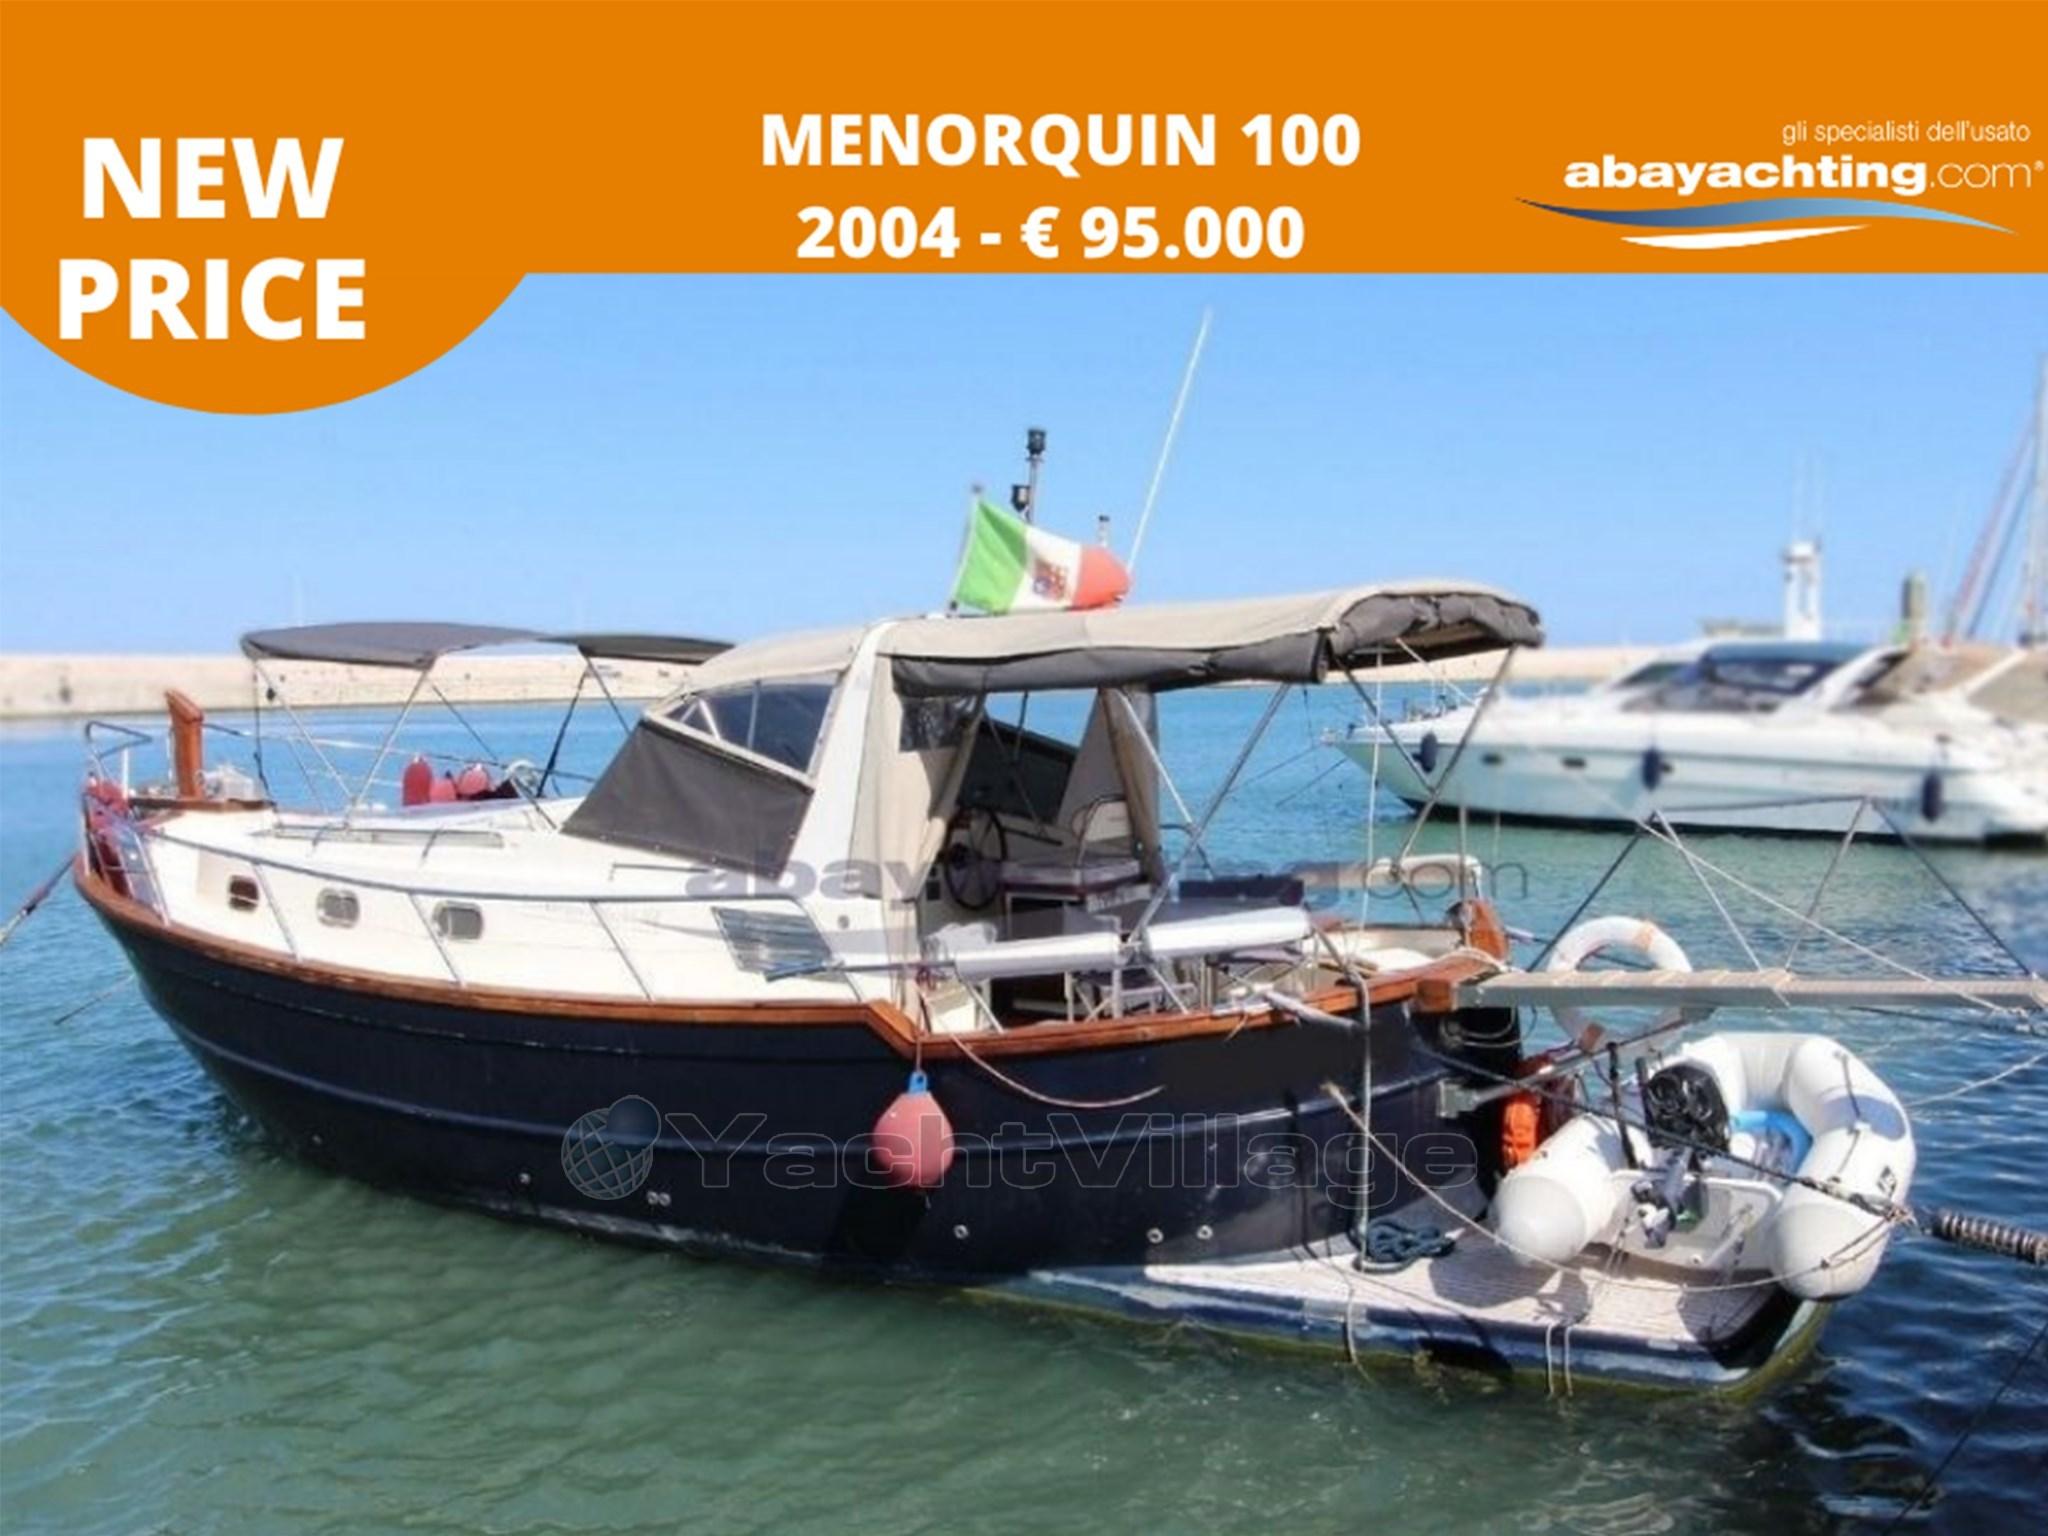 Abayachting Nuovo prezzo Menorquin 100